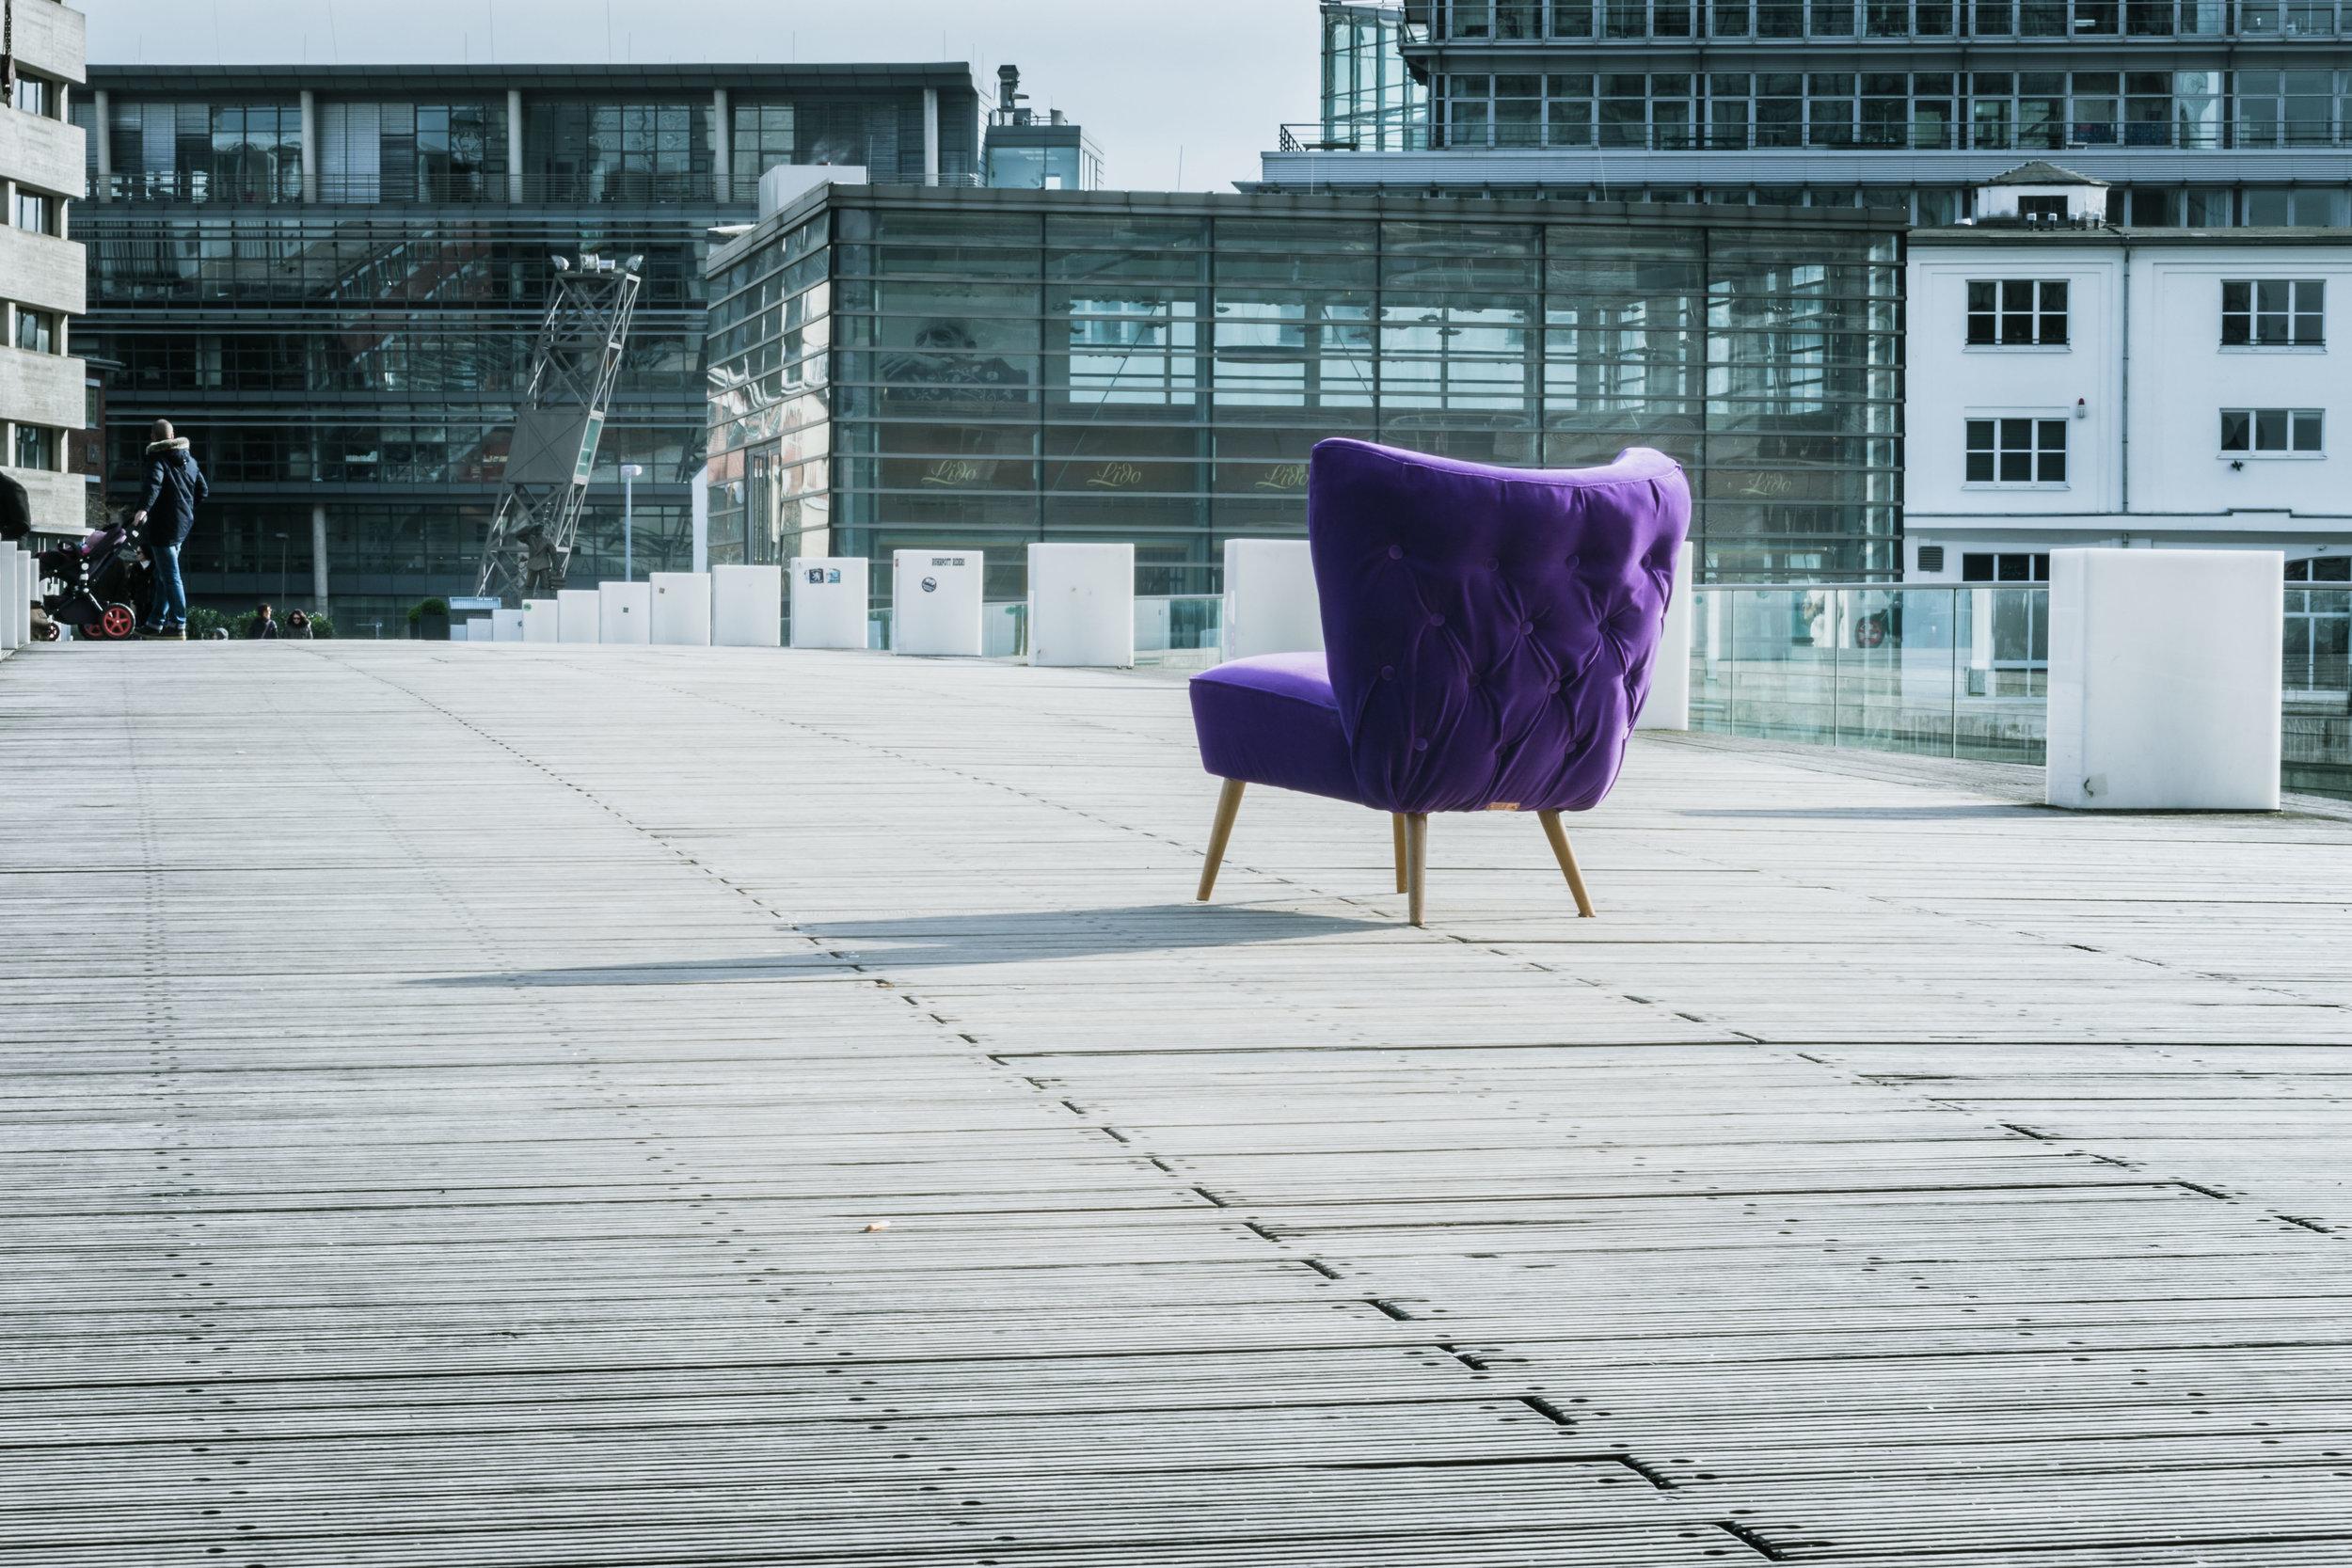 Purple chair in urban surroundings